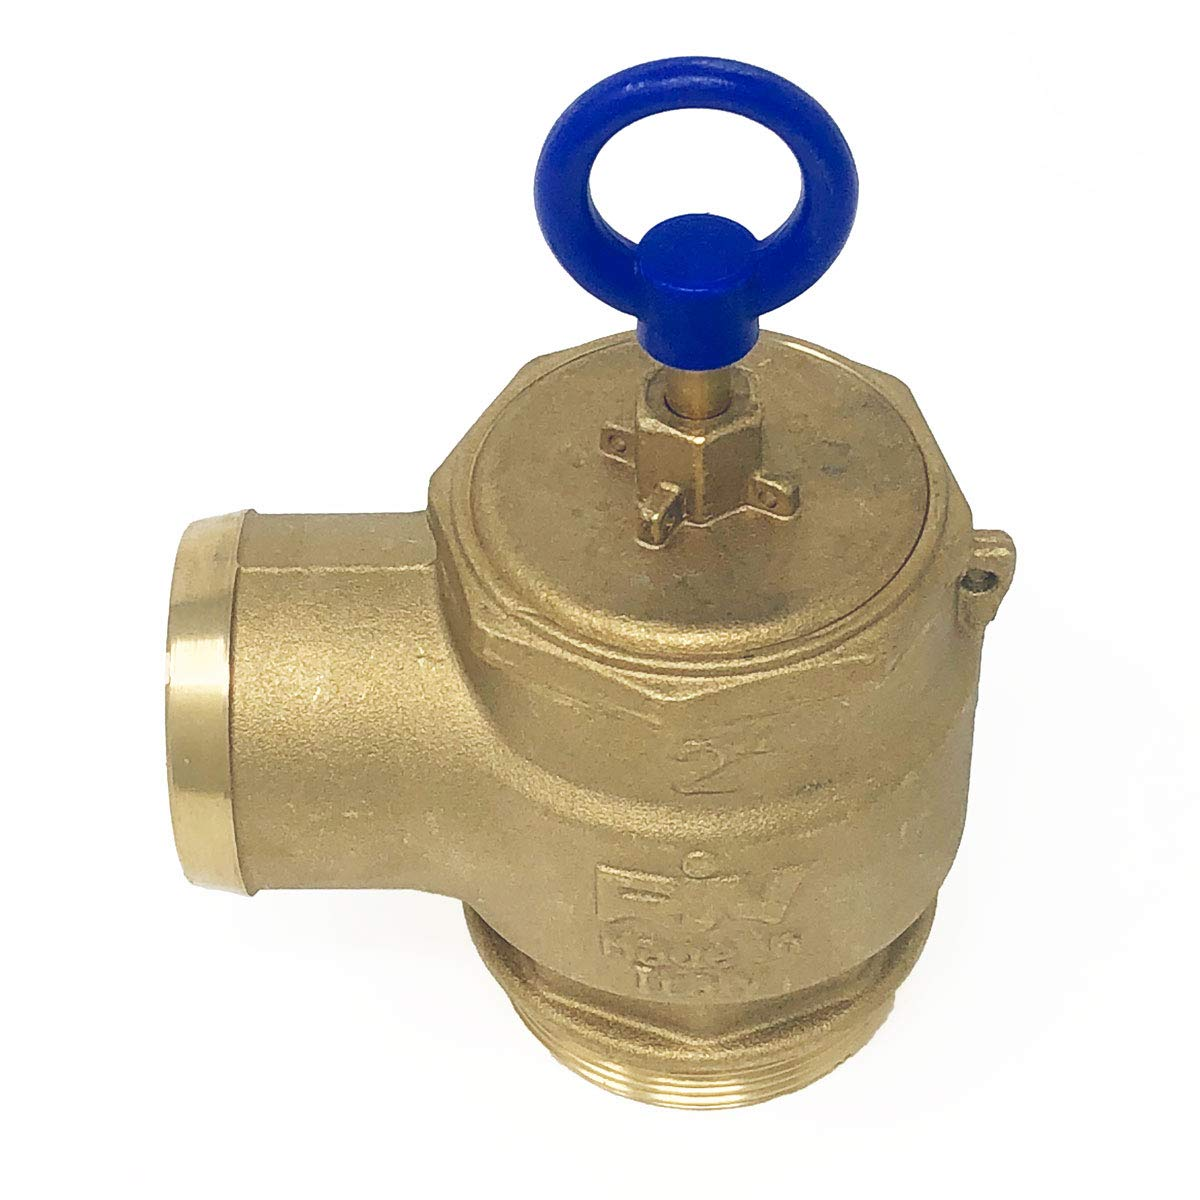 Brass Pressure Relief Valve 300 CFM 2 Diameter 1050-0000 RIV Fully Adjustable Non-Code